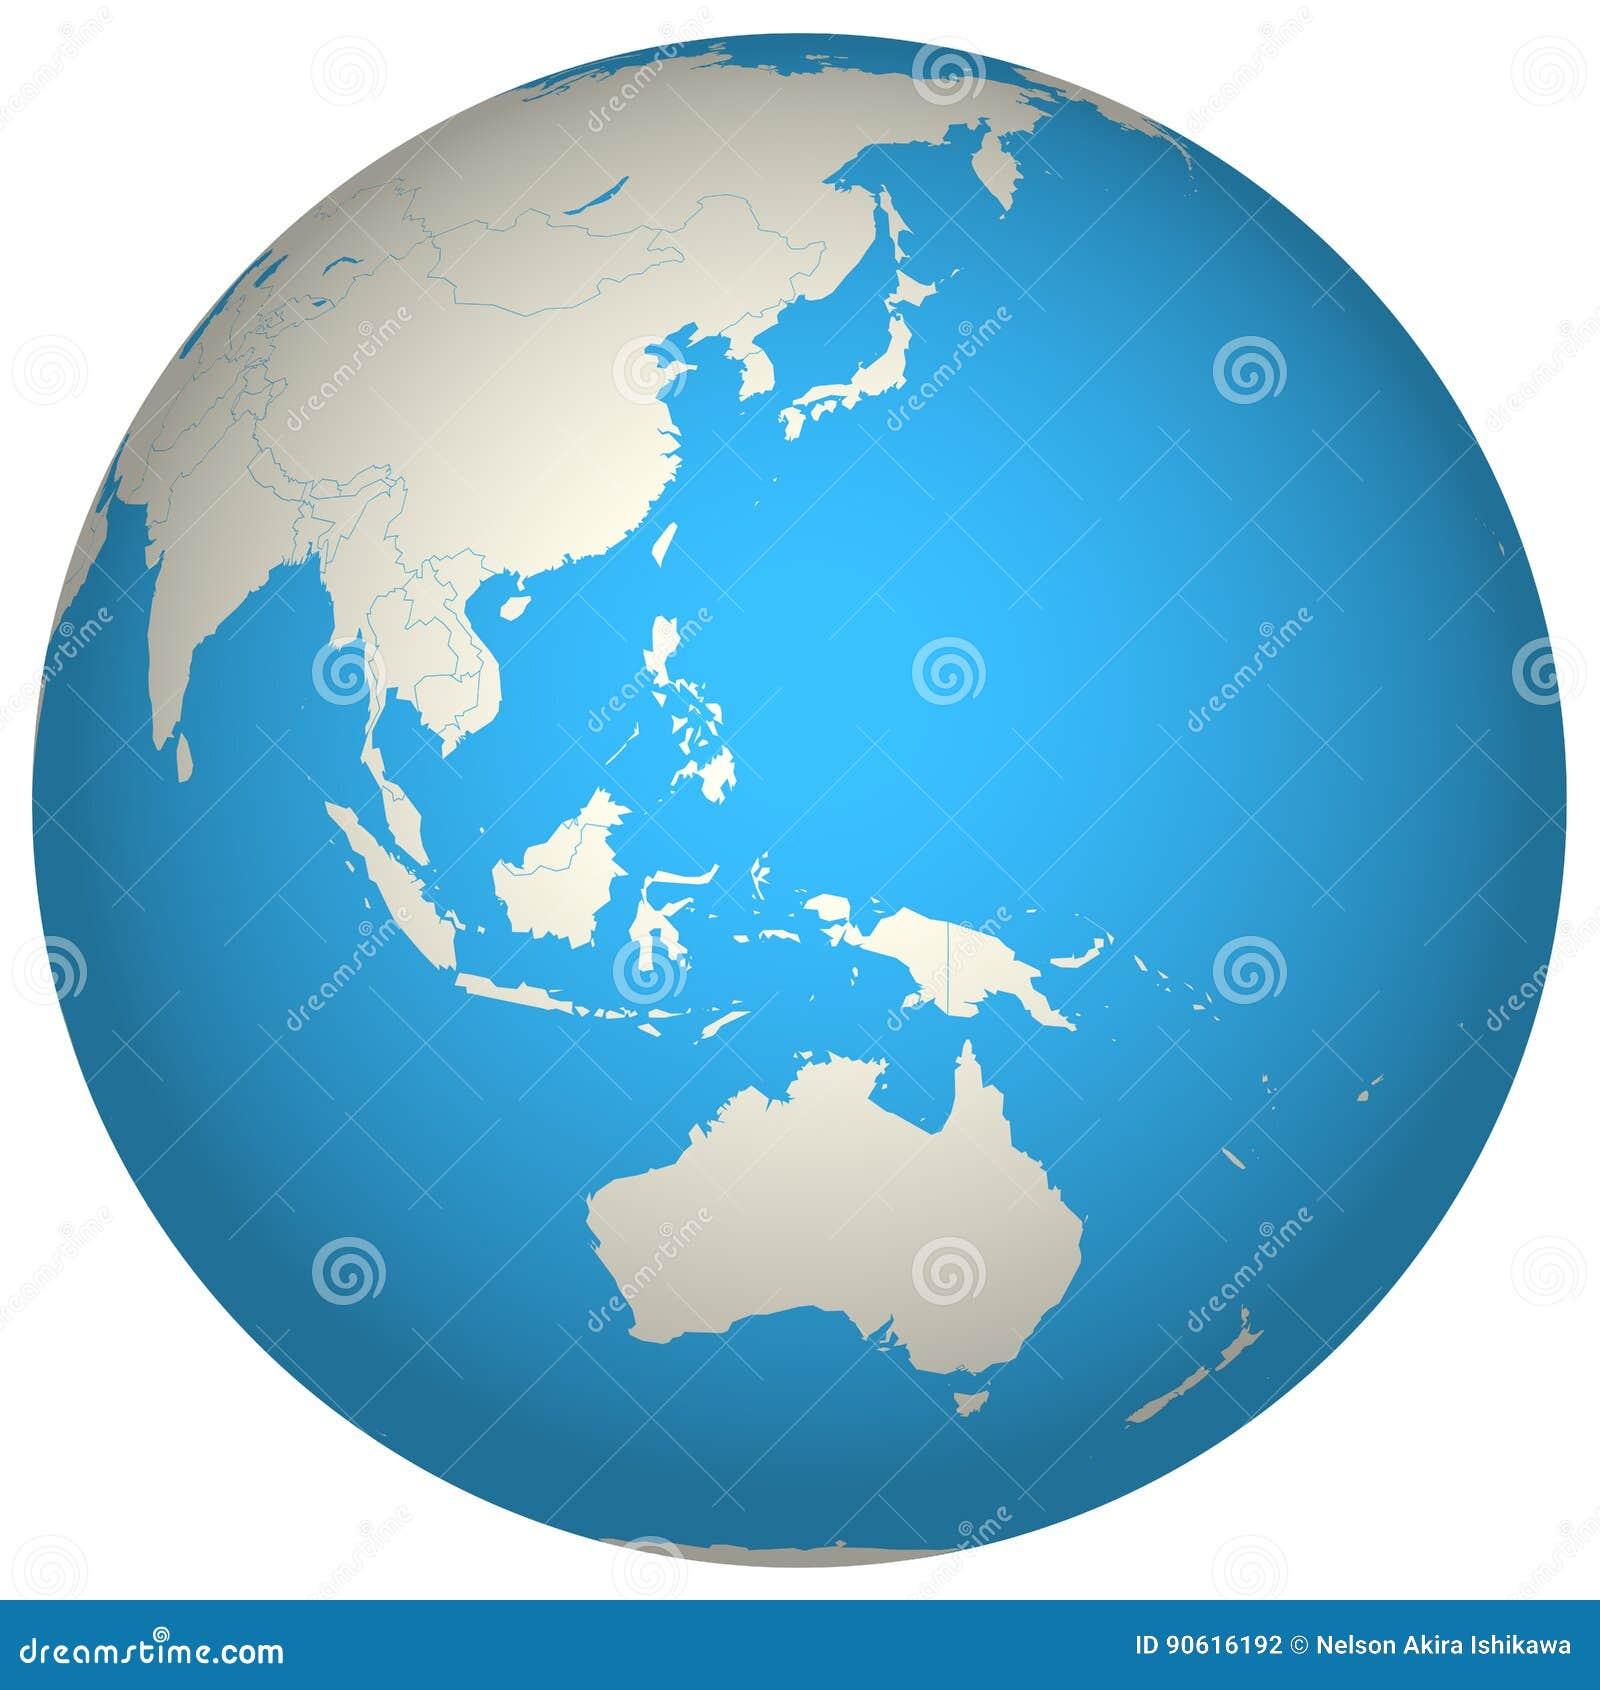 Asia date online in Australia